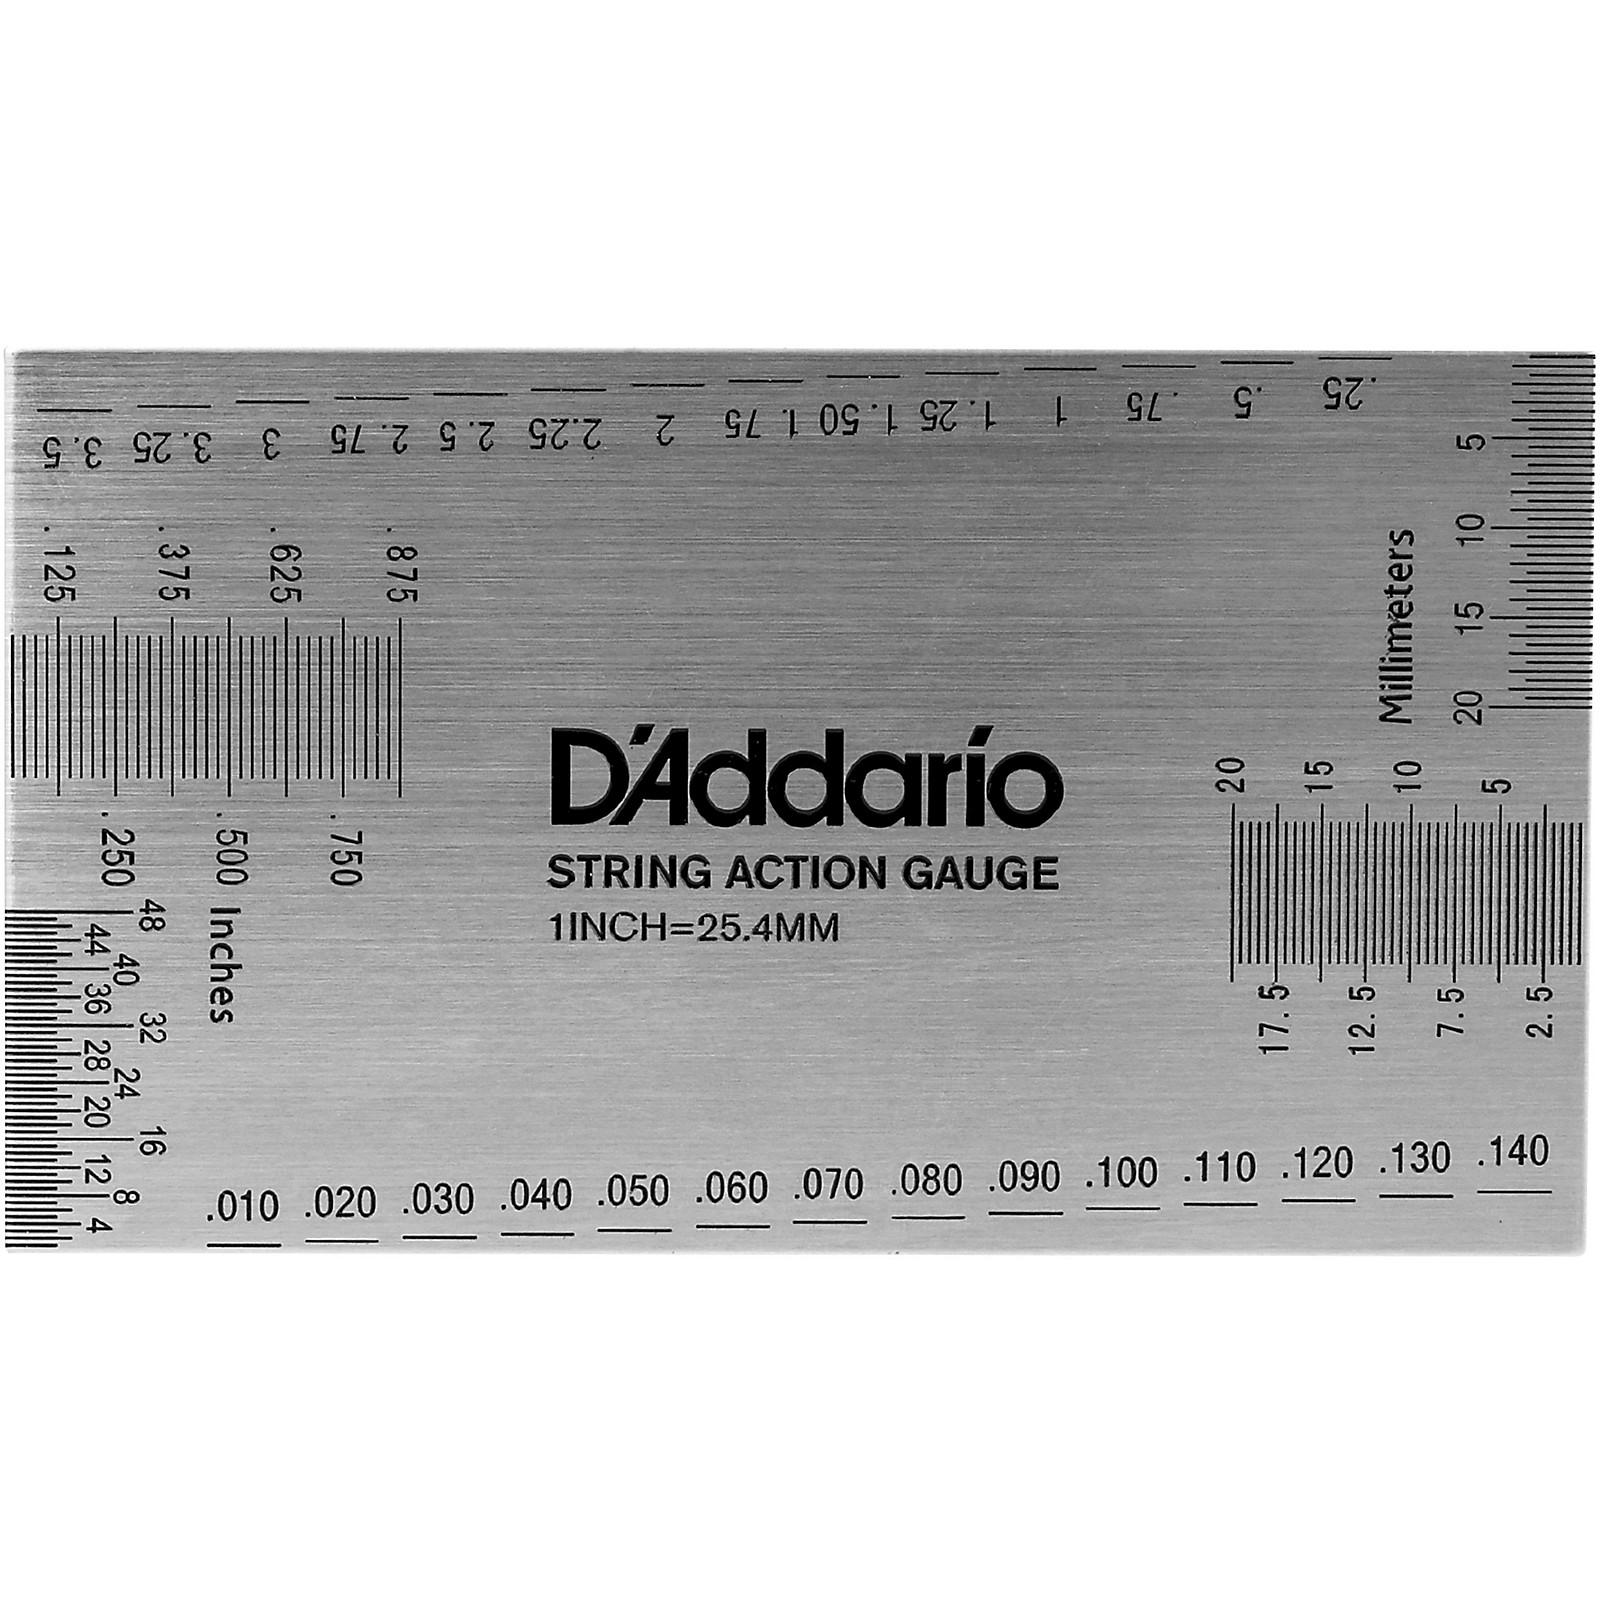 D'Addario Planet Waves String Height Gauge